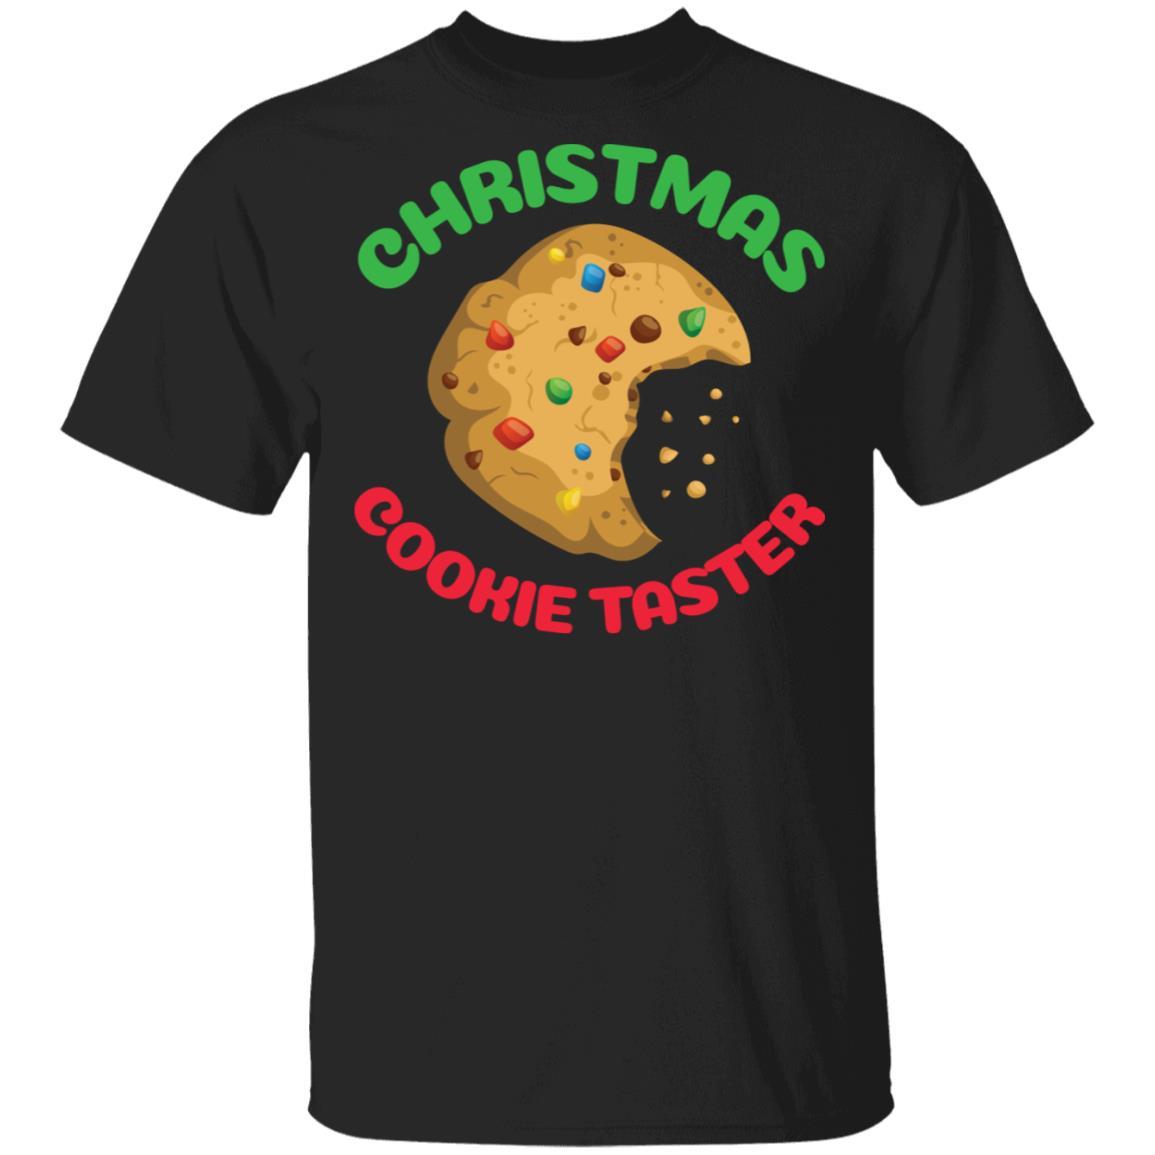 Christmas Cookie Taster Funny Xmas Text Unisex Short Sleeve